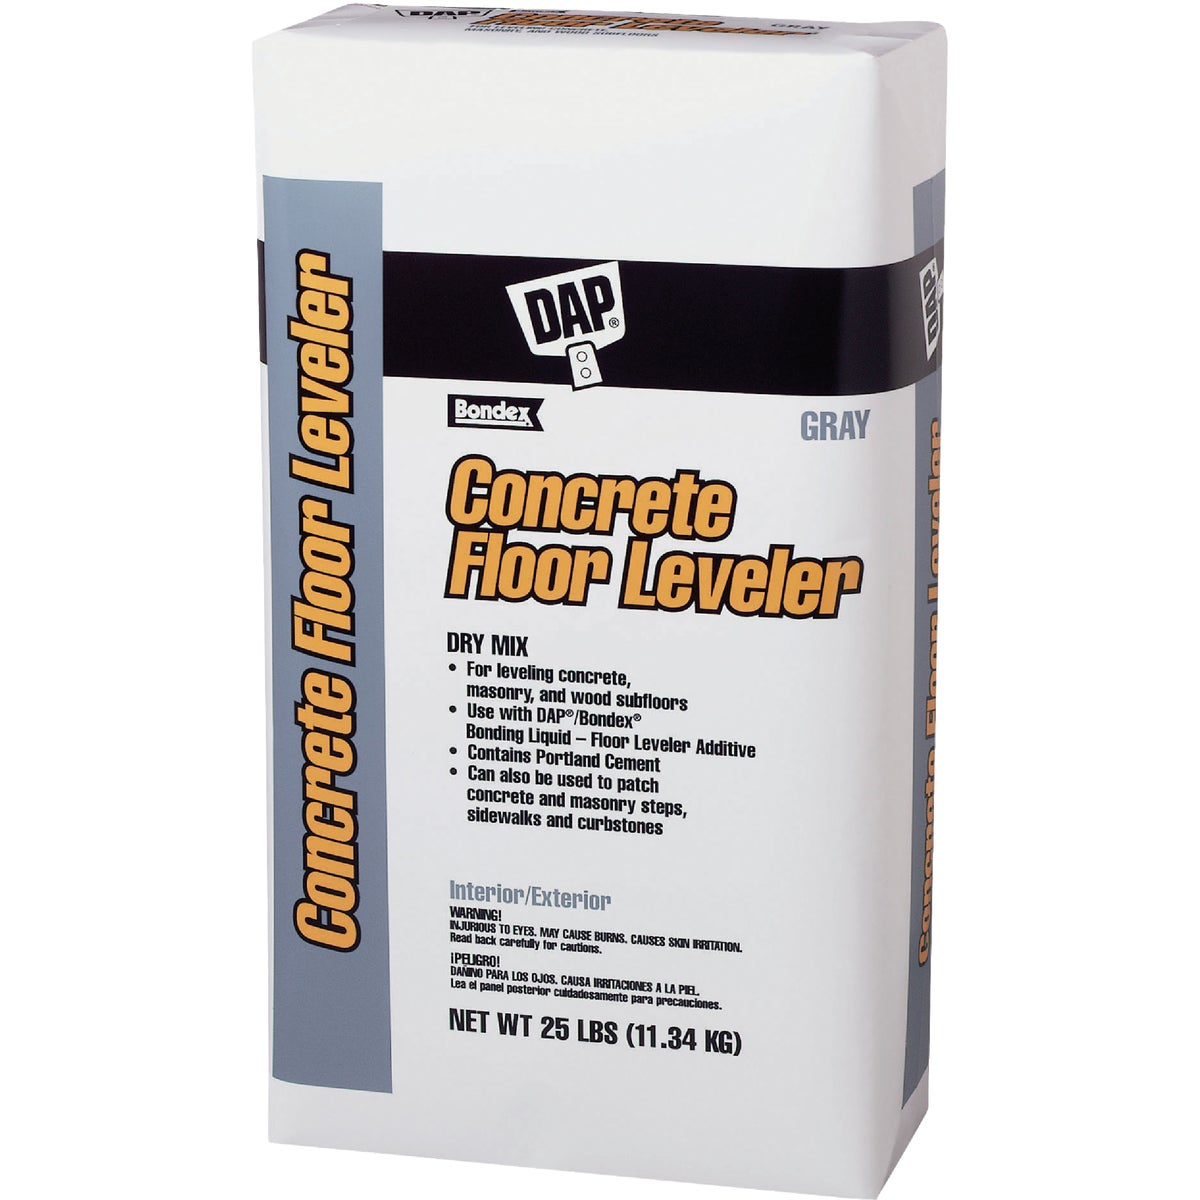 25LB BAG FLOOR LEVELER - 10416 by Dap Inc